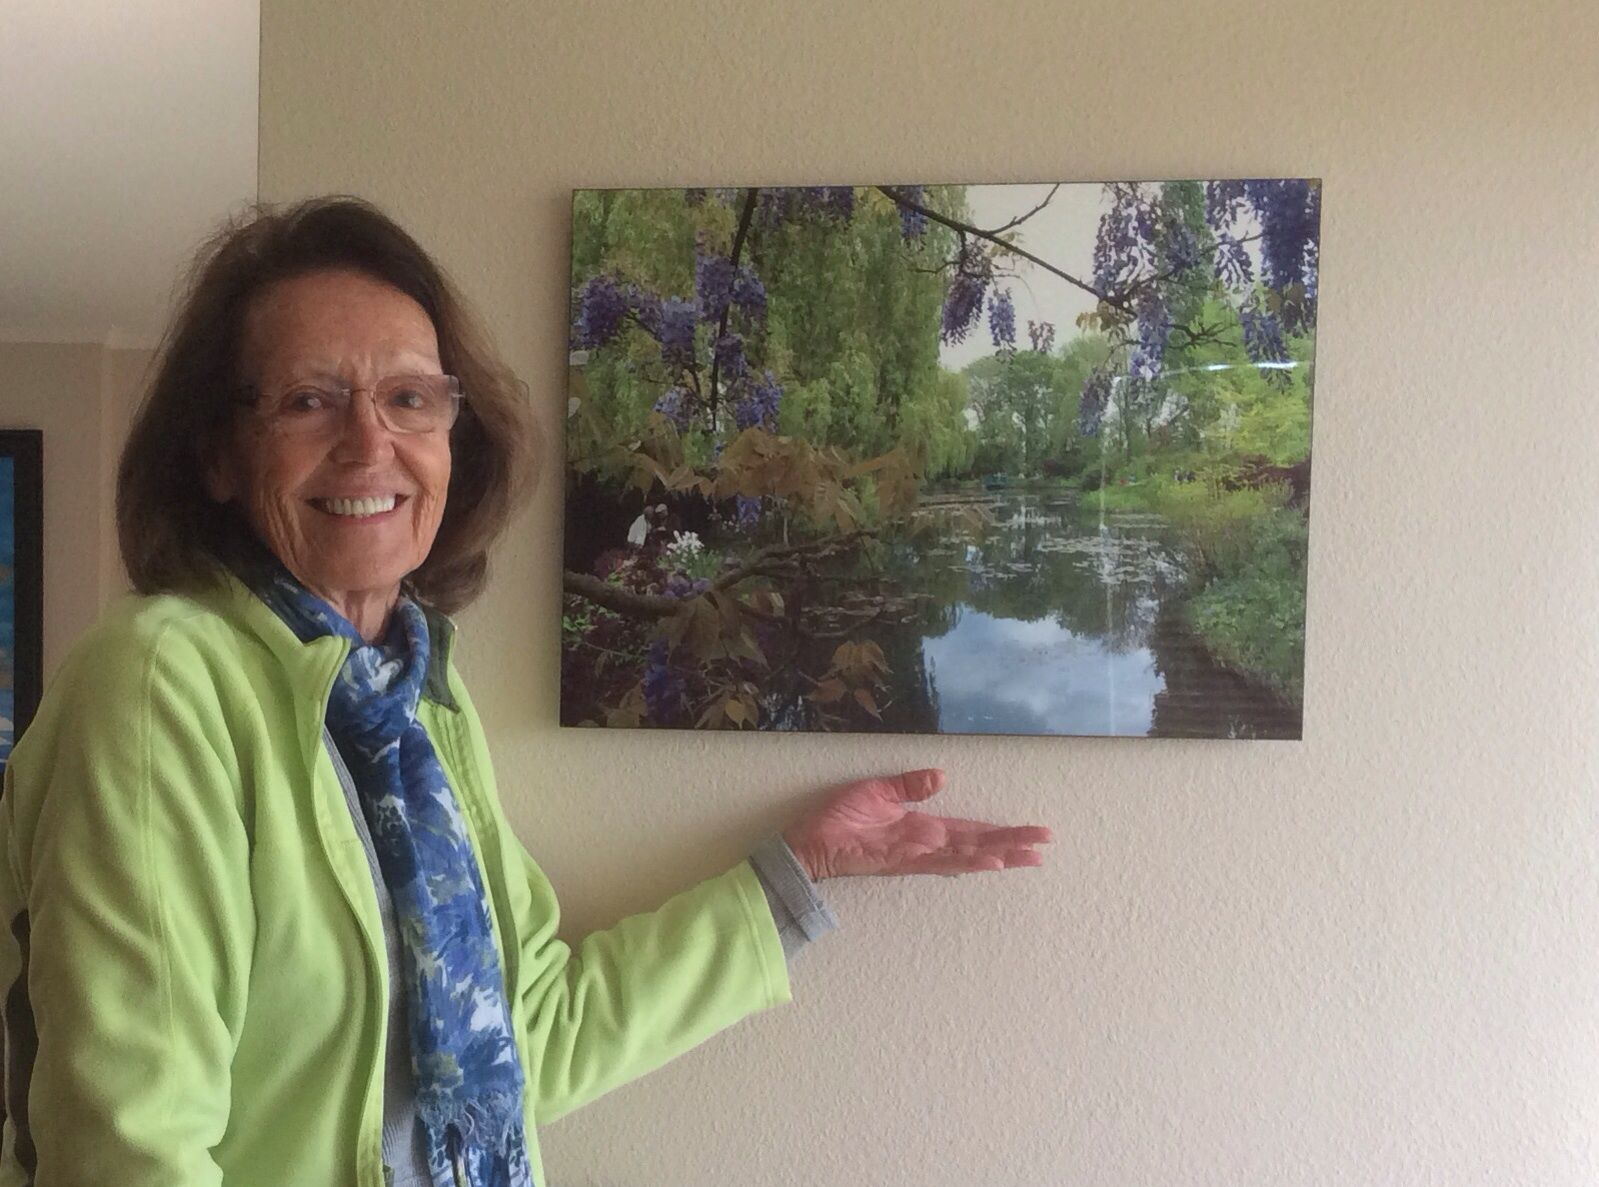 My Photo printed on metal of Monet's garden